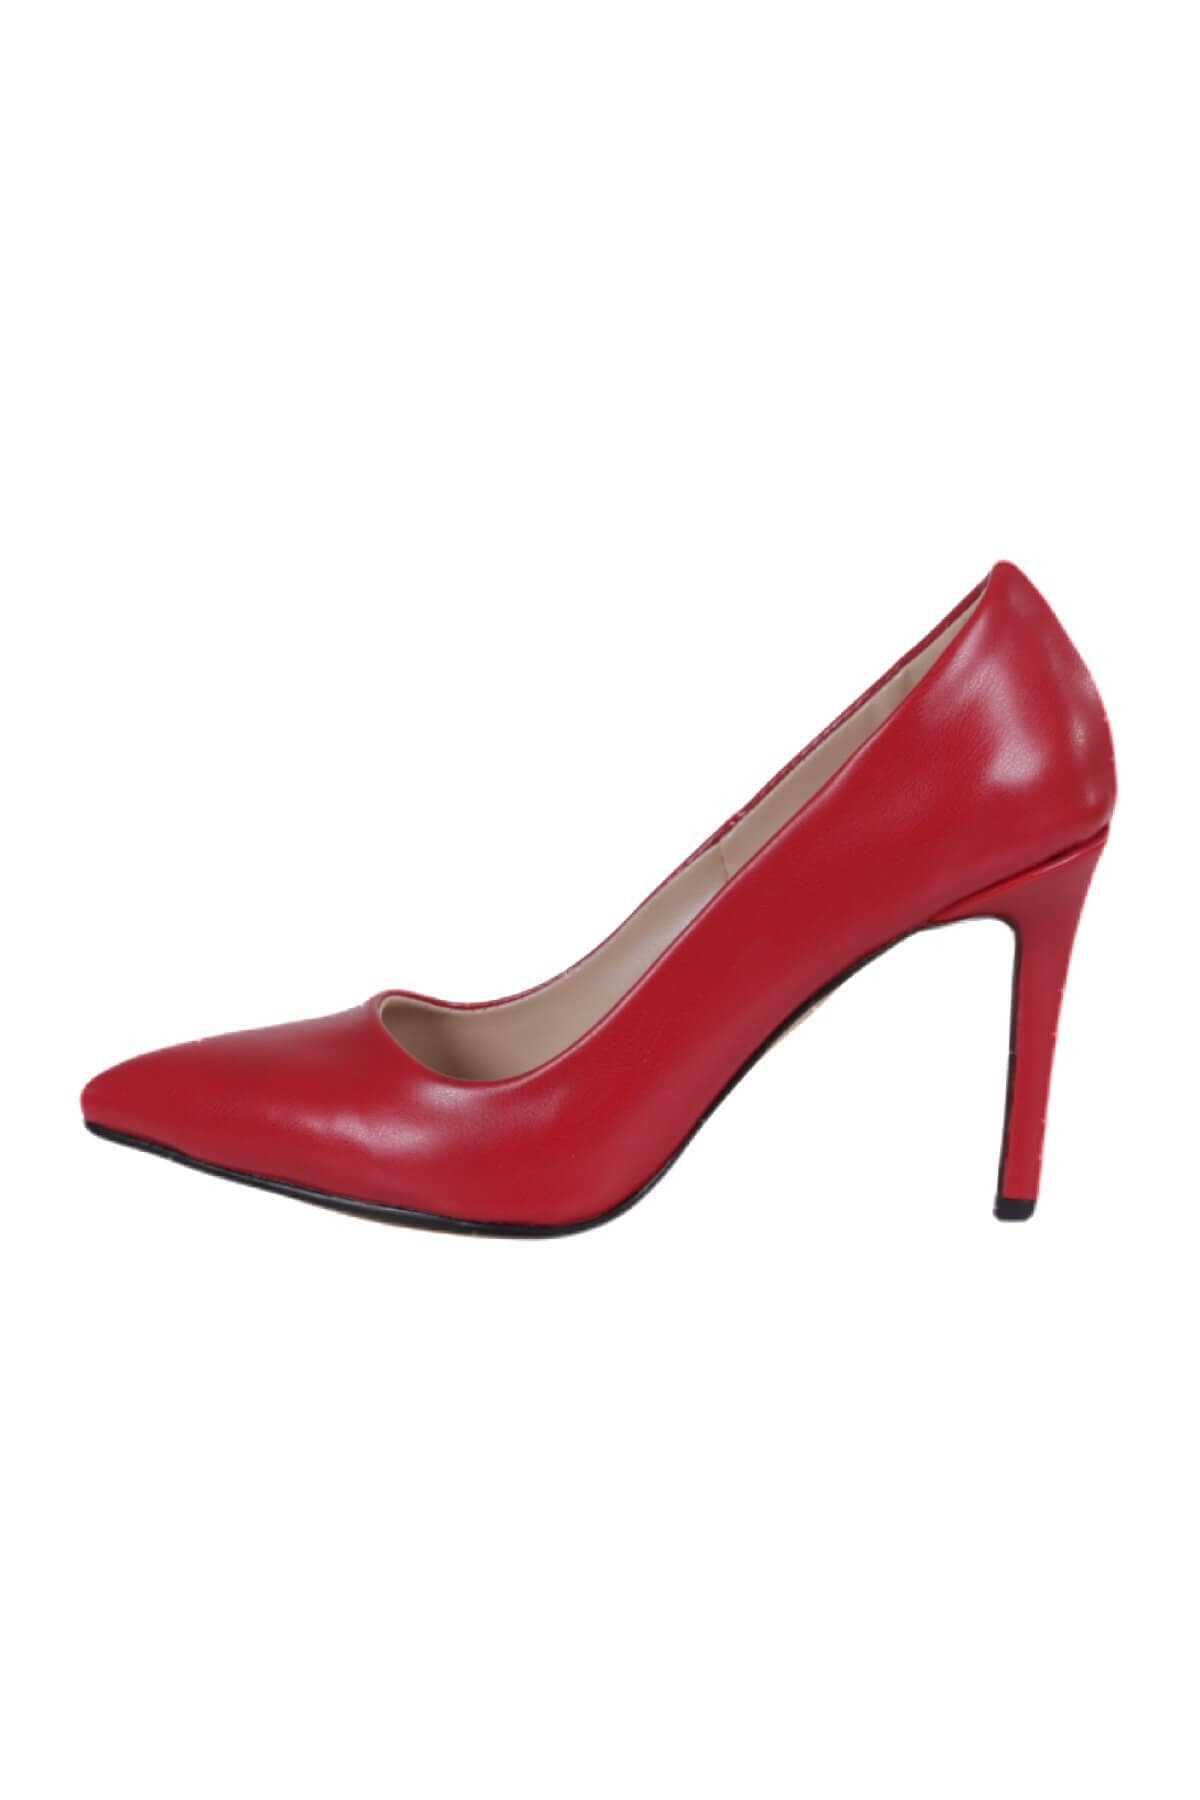 Mio Gusto Basic Kırmızı Stiletto 4